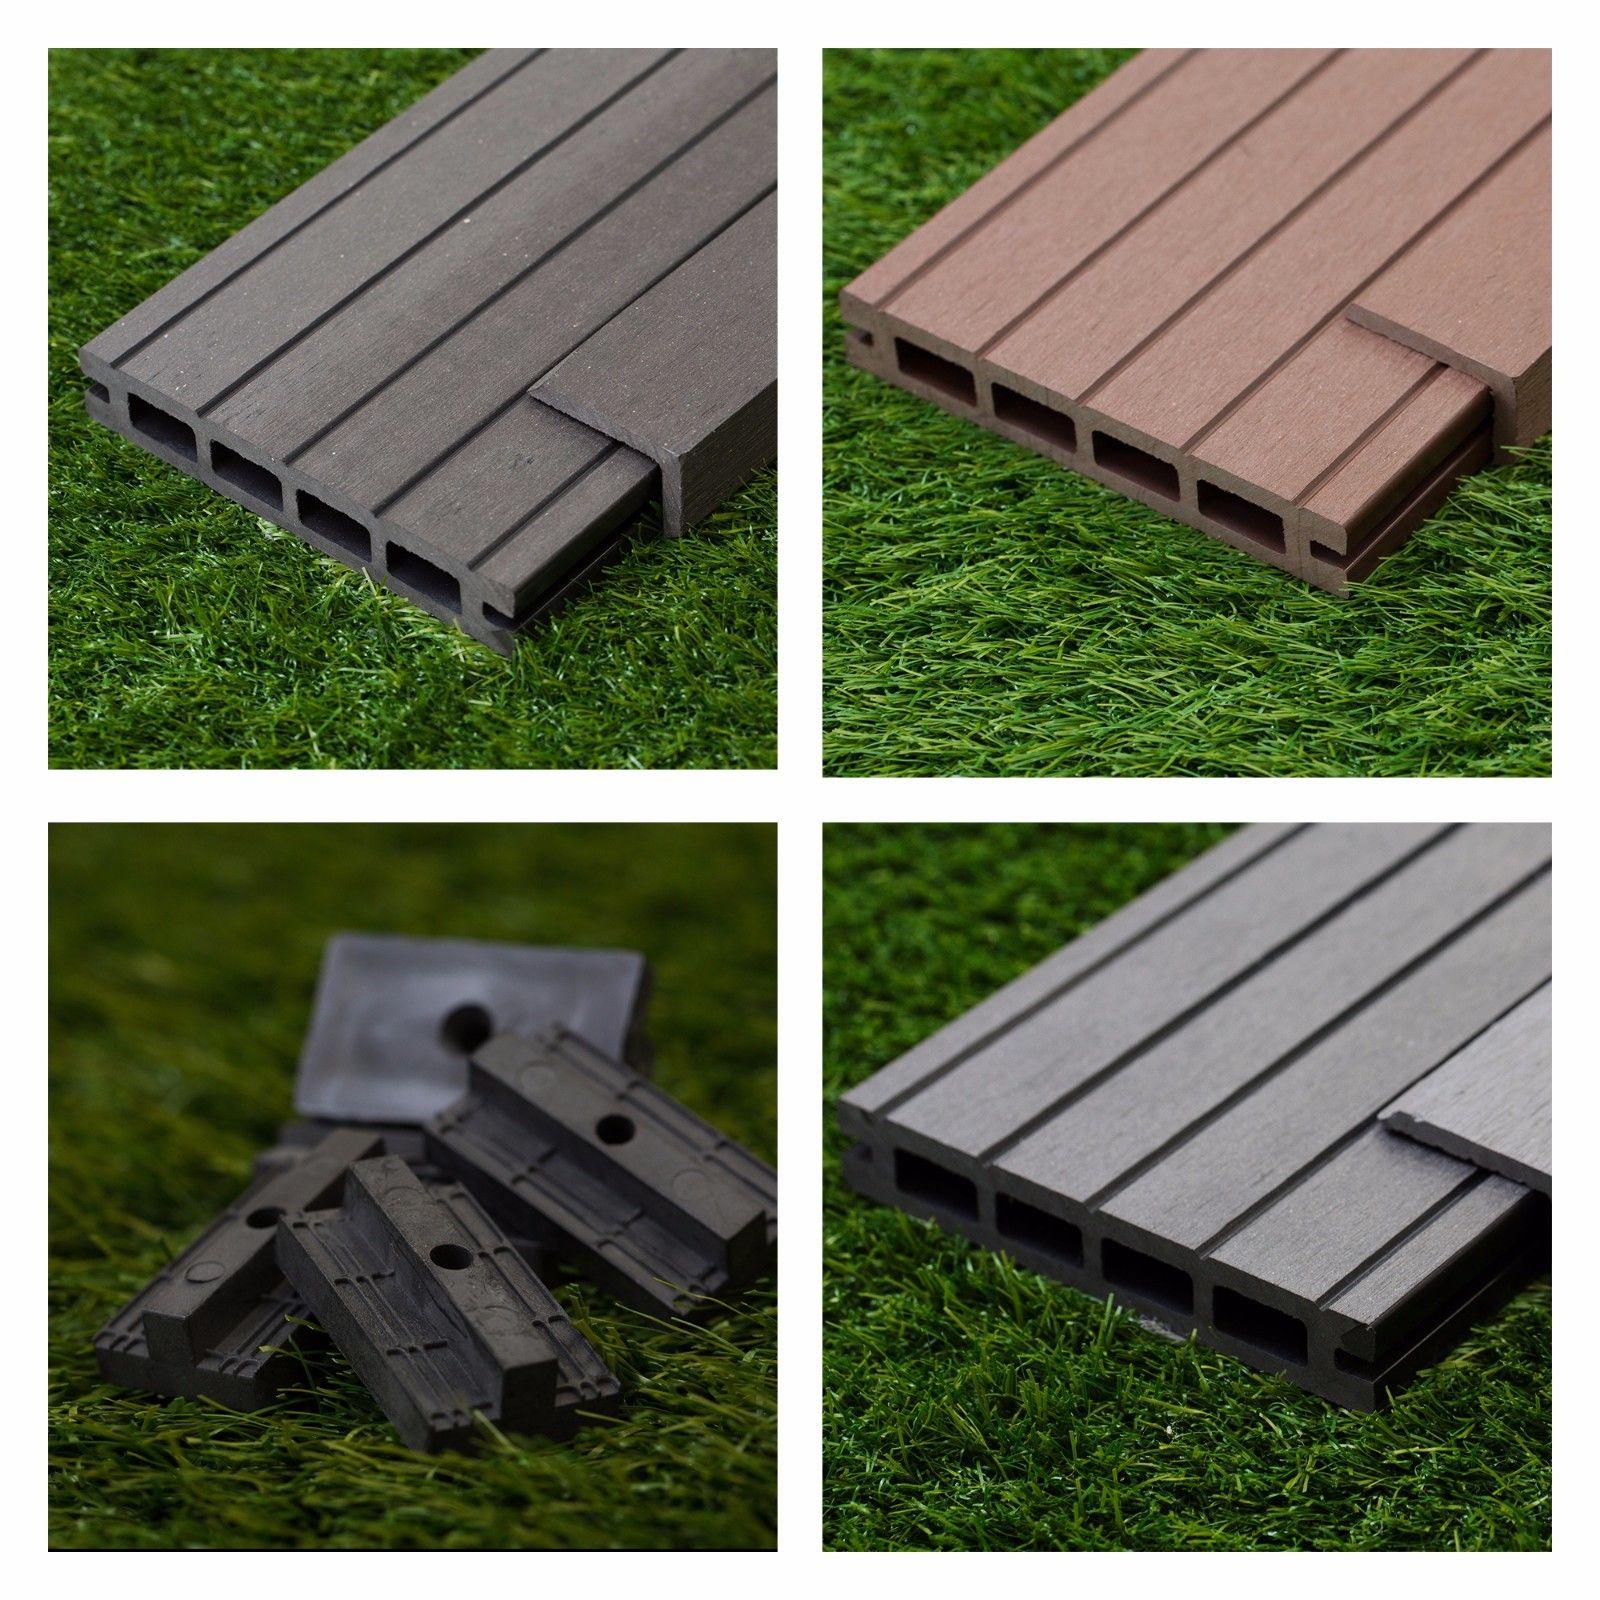 31 SqM of Wooden Composite Decking Inc Boards, Edging & Repairing Packs